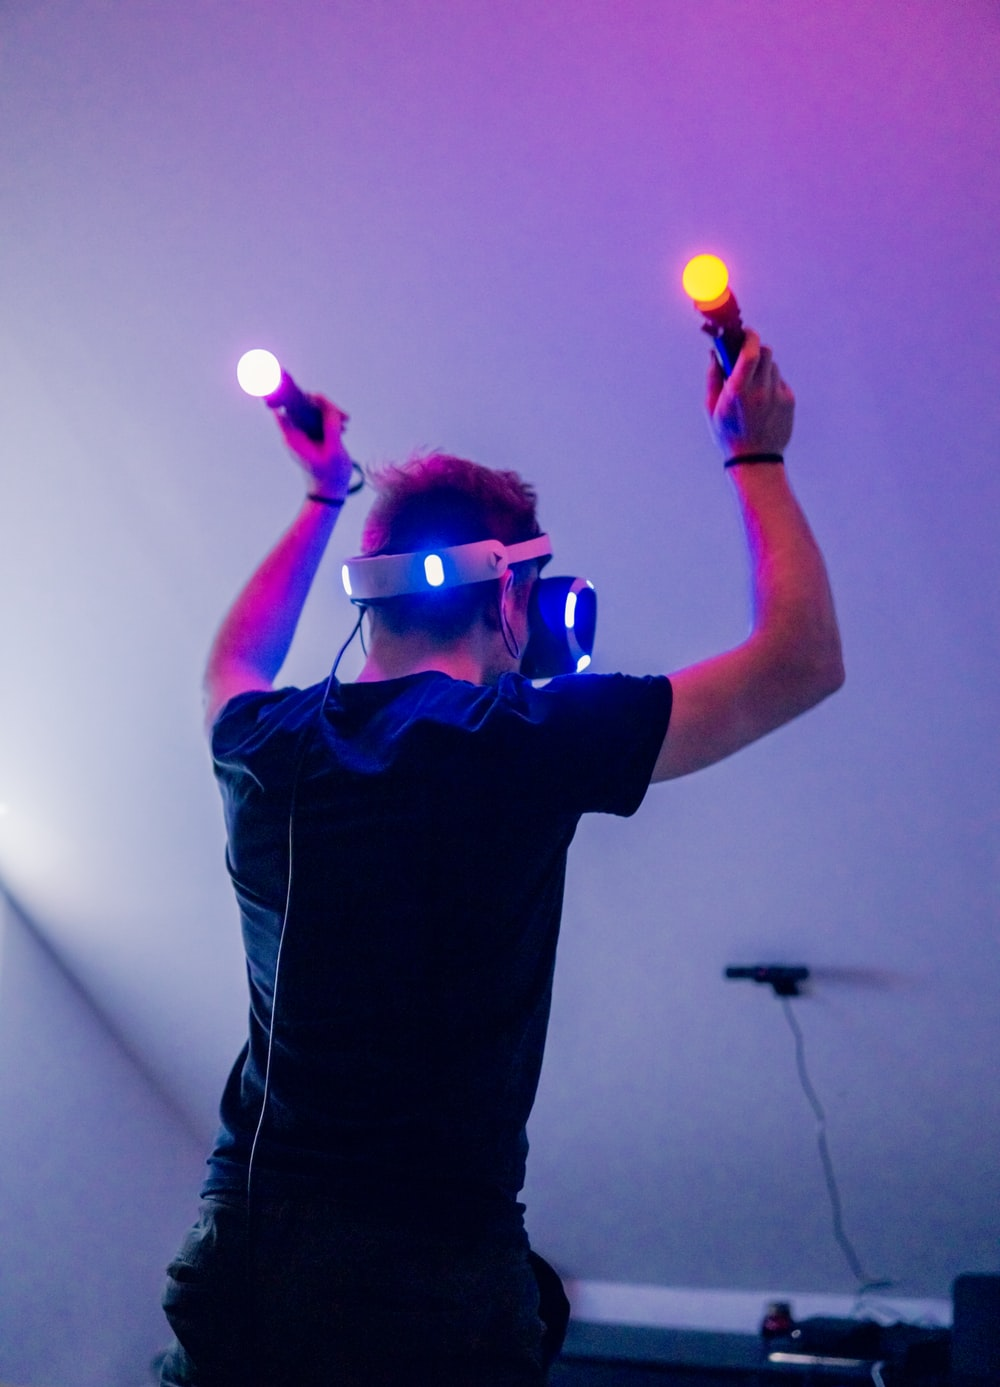 man playing using VR headset